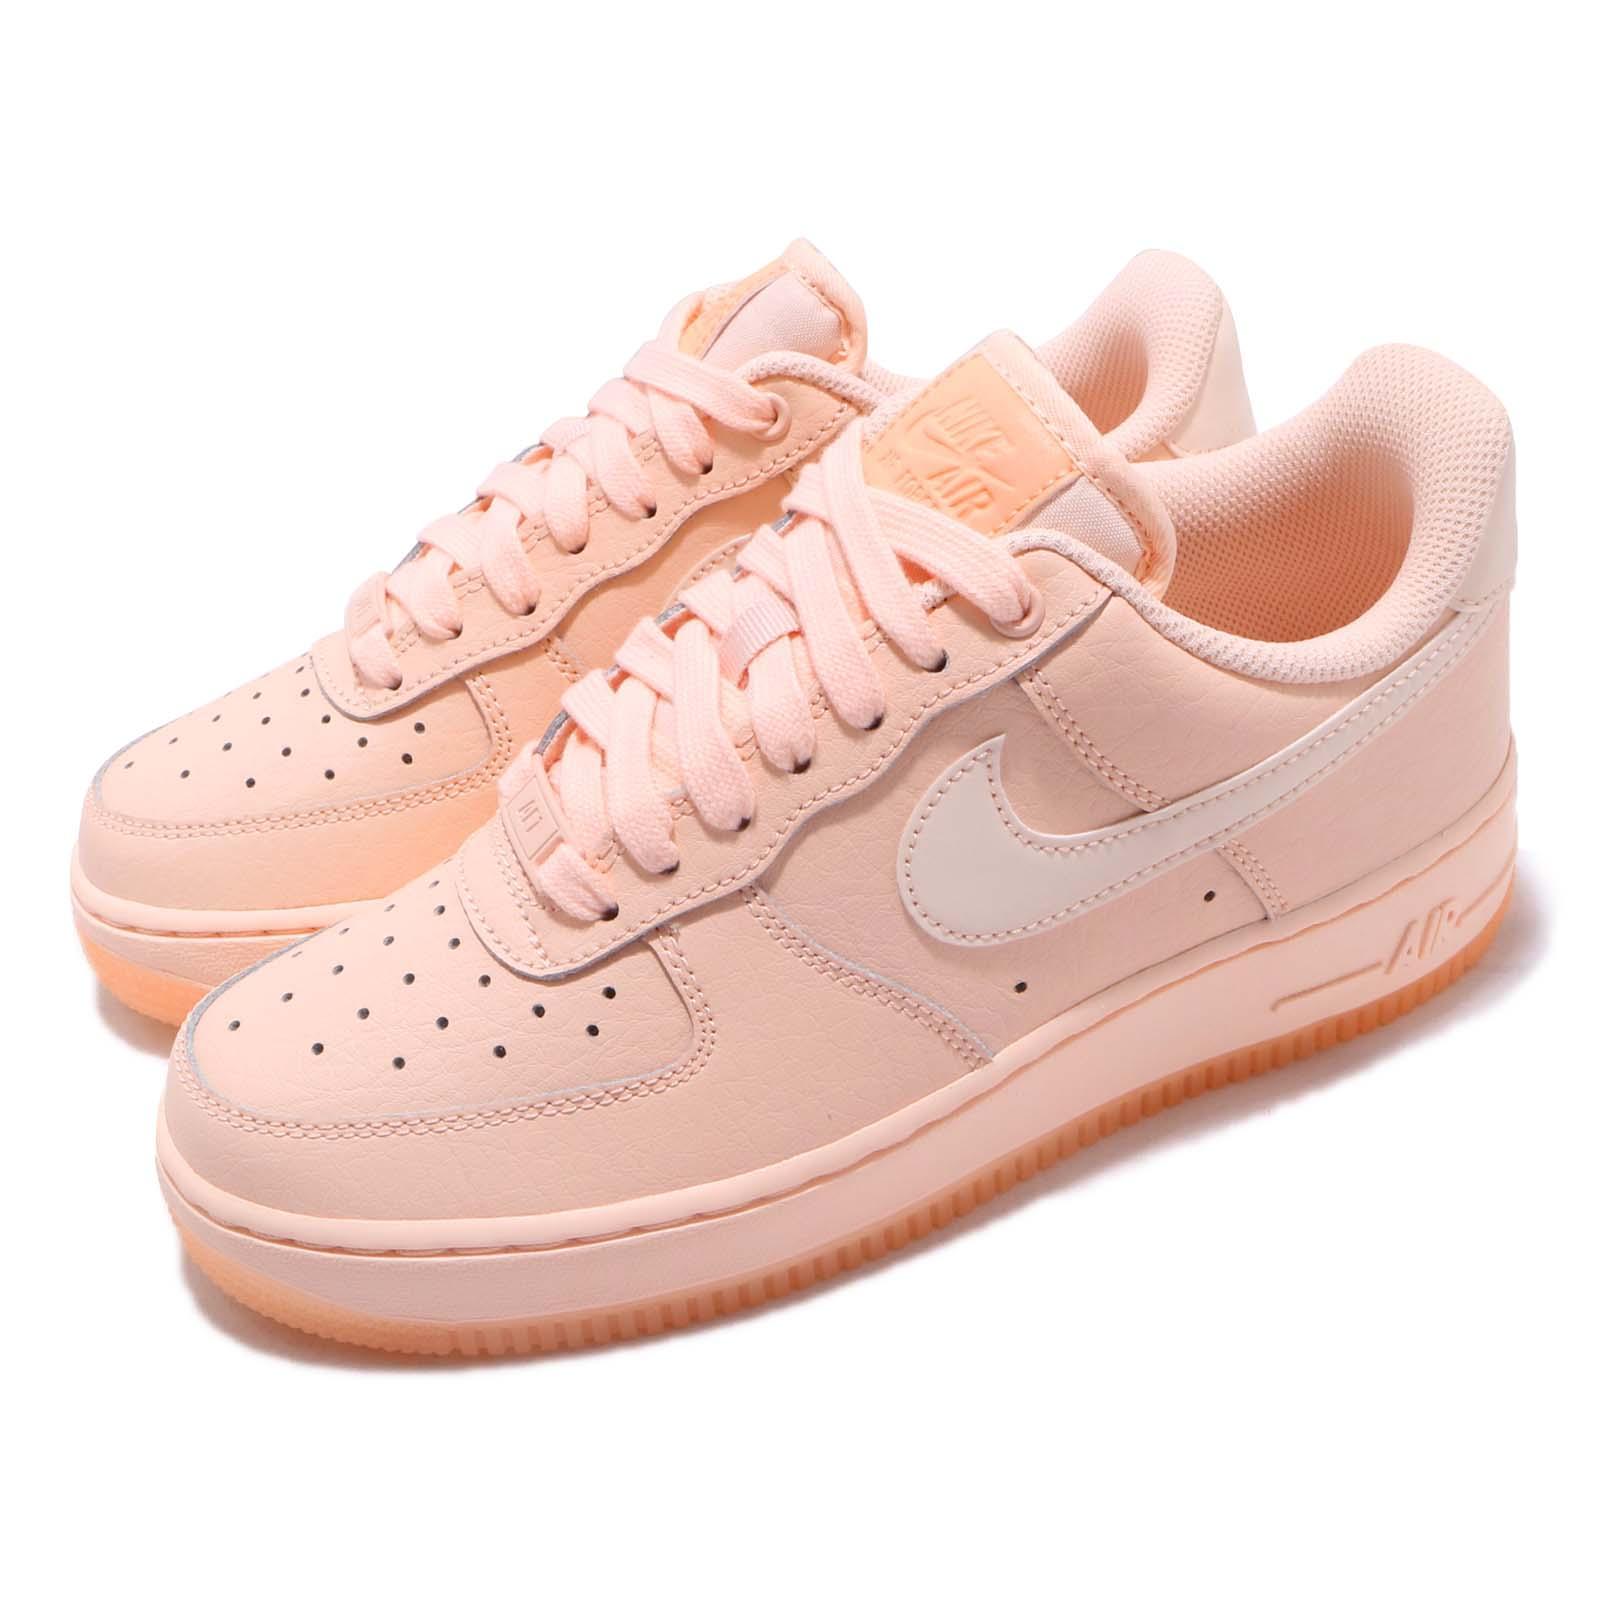 Nike 休閒鞋 Air Force 1 07 運動 女鞋 AO2132-800